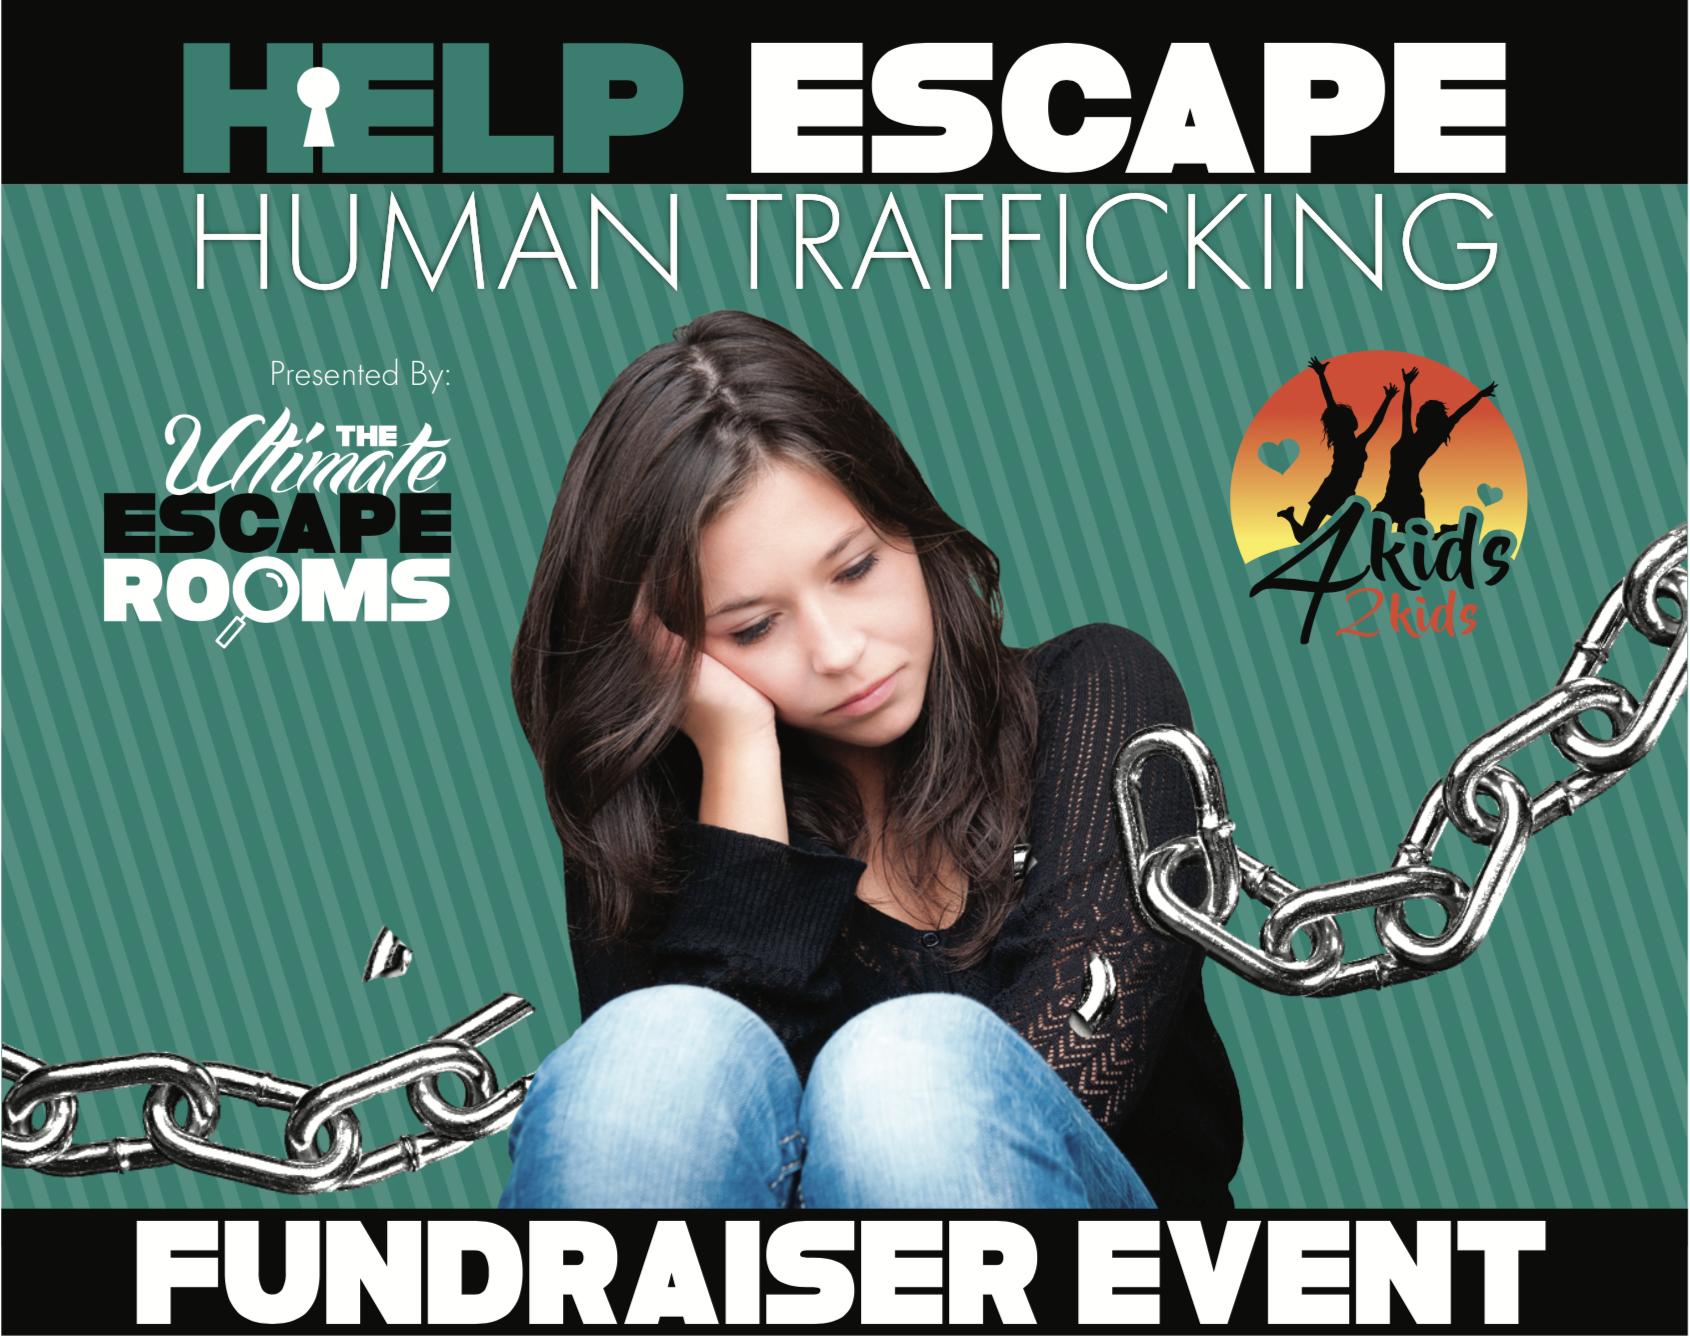 Help escape human trafficking